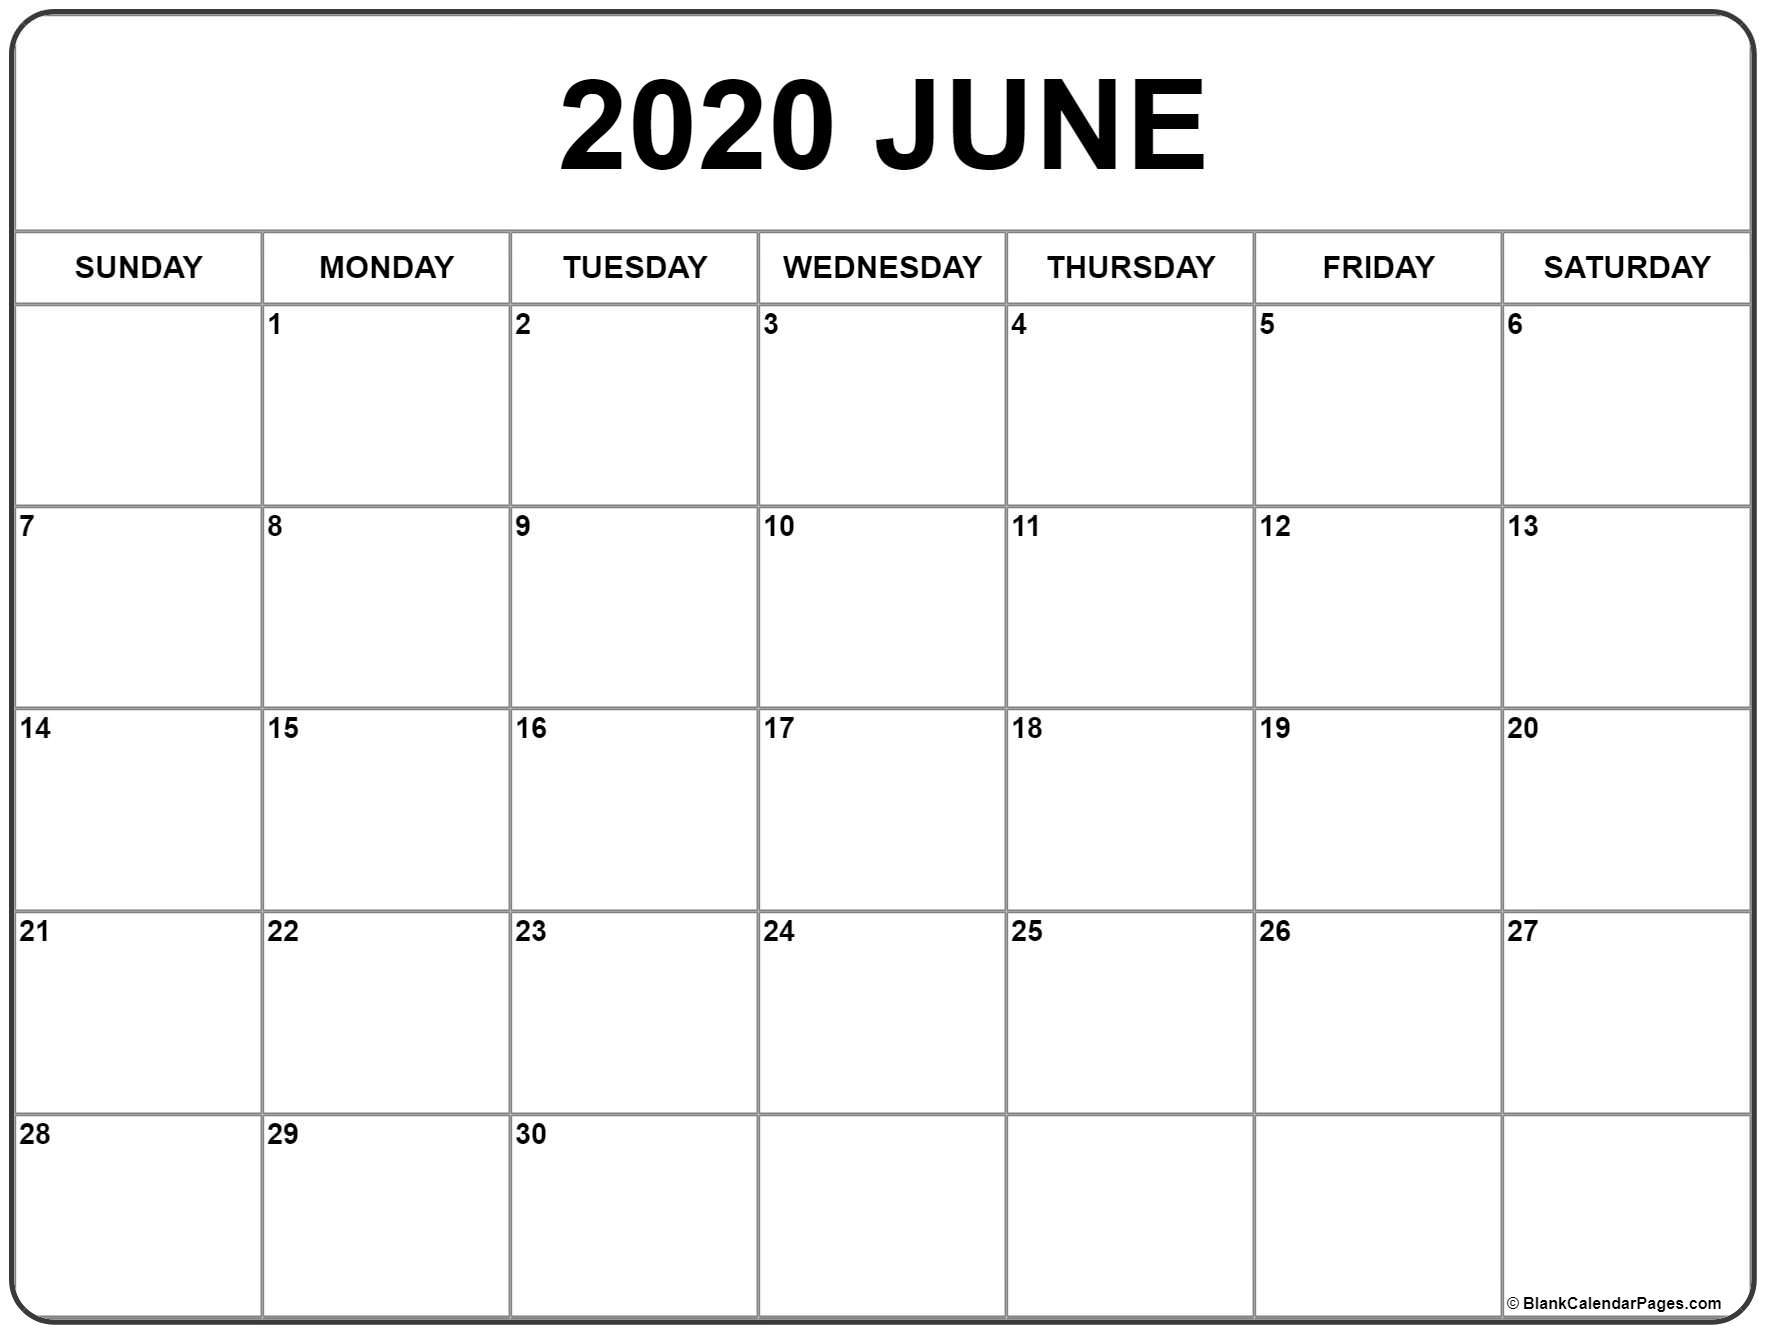 June 2020 Calendar | Free Printable Monthly Calendars for Free Printable 2020 Calendar With Space To Write